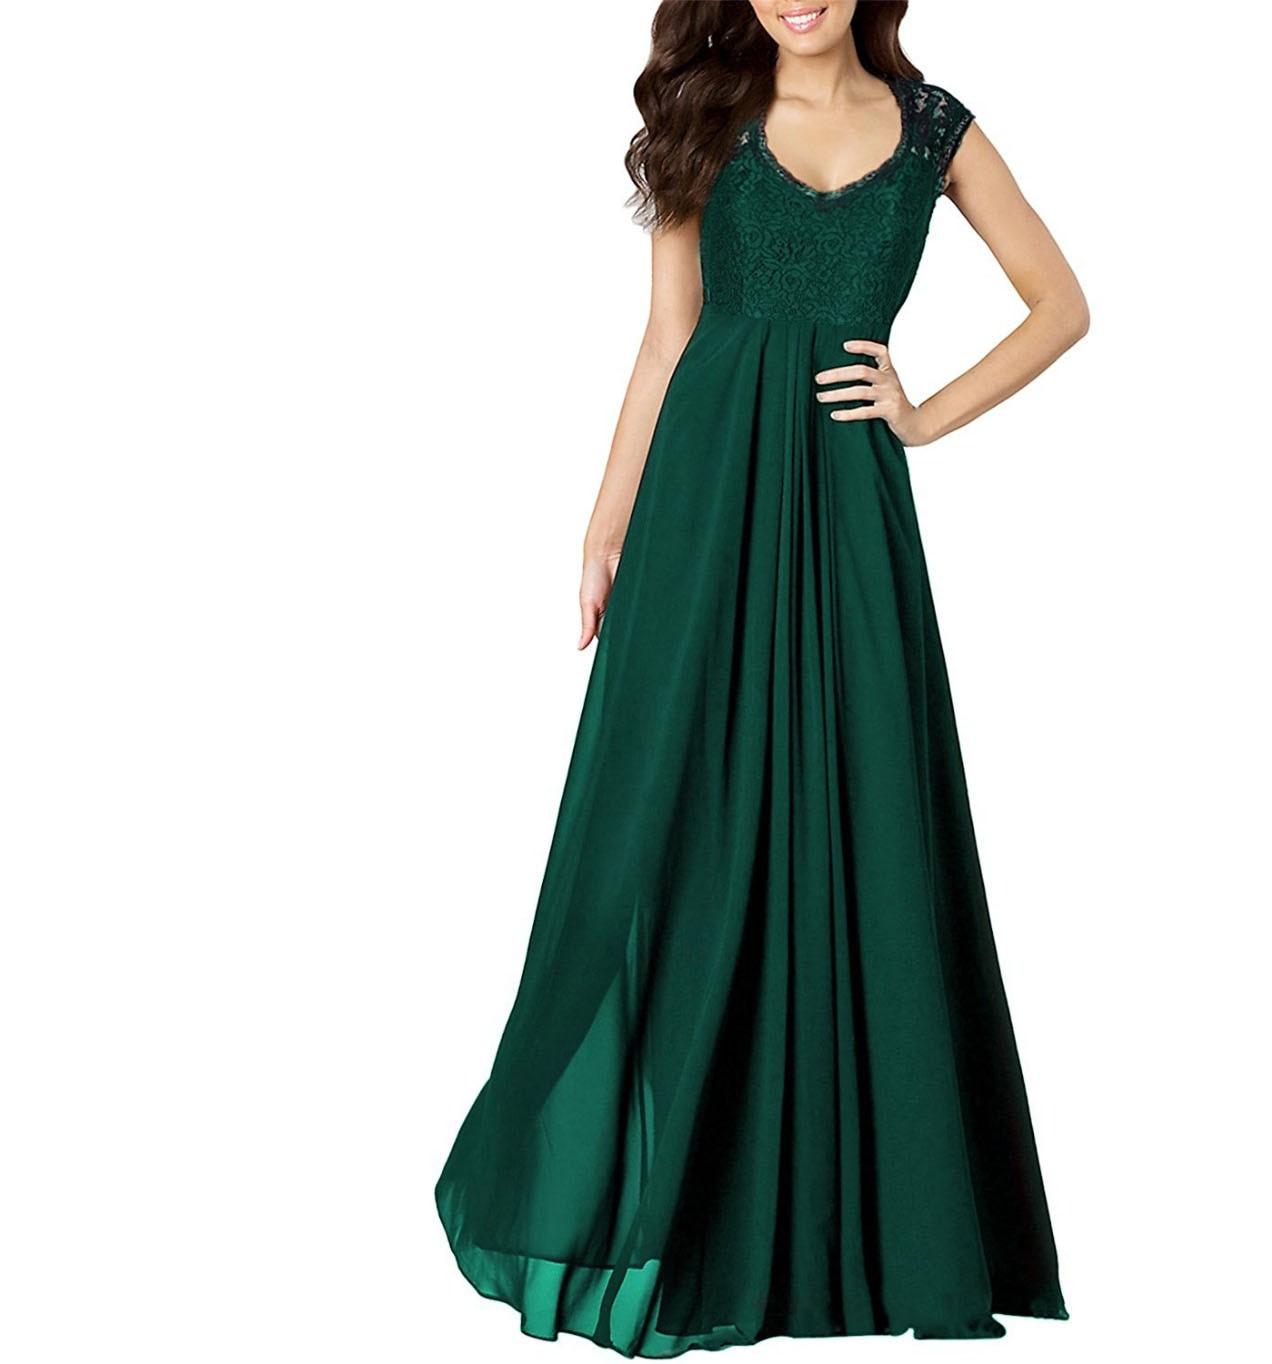 Women Dress Casual A Line Sleeveless Vestidos Lace Floor